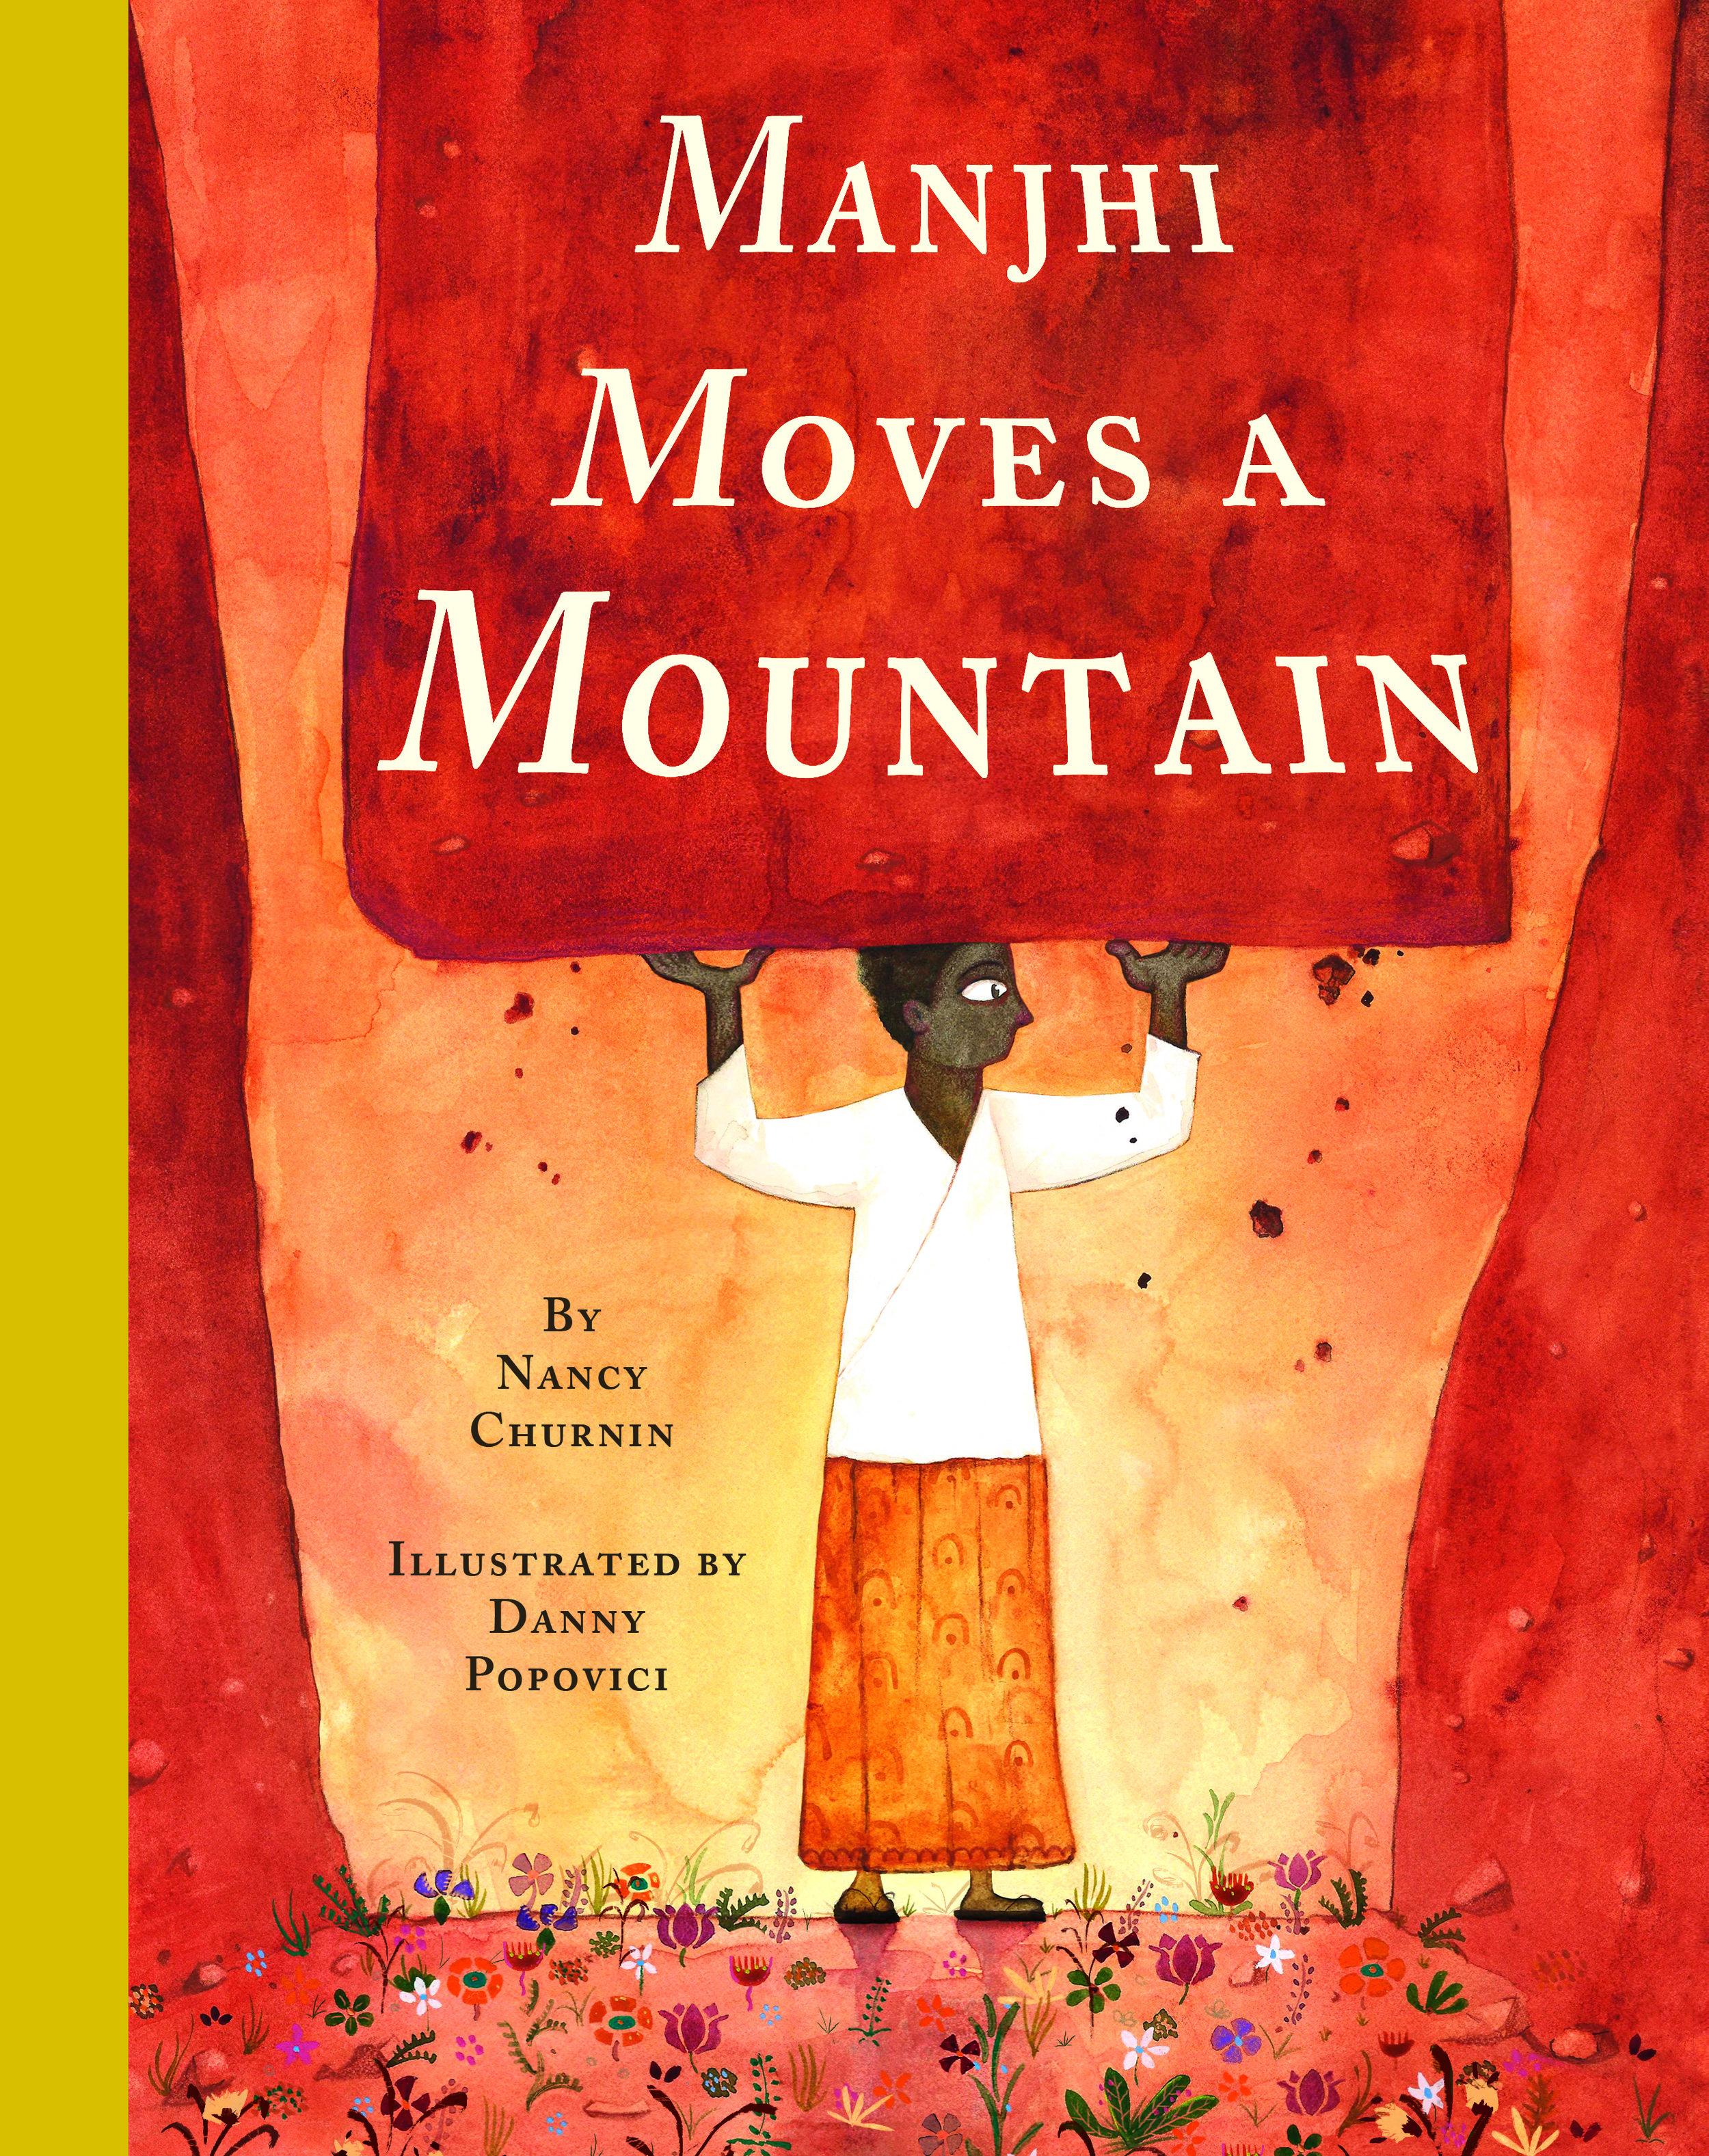 Teacher Guide for MANJHI MOVES A MOUNTAIN